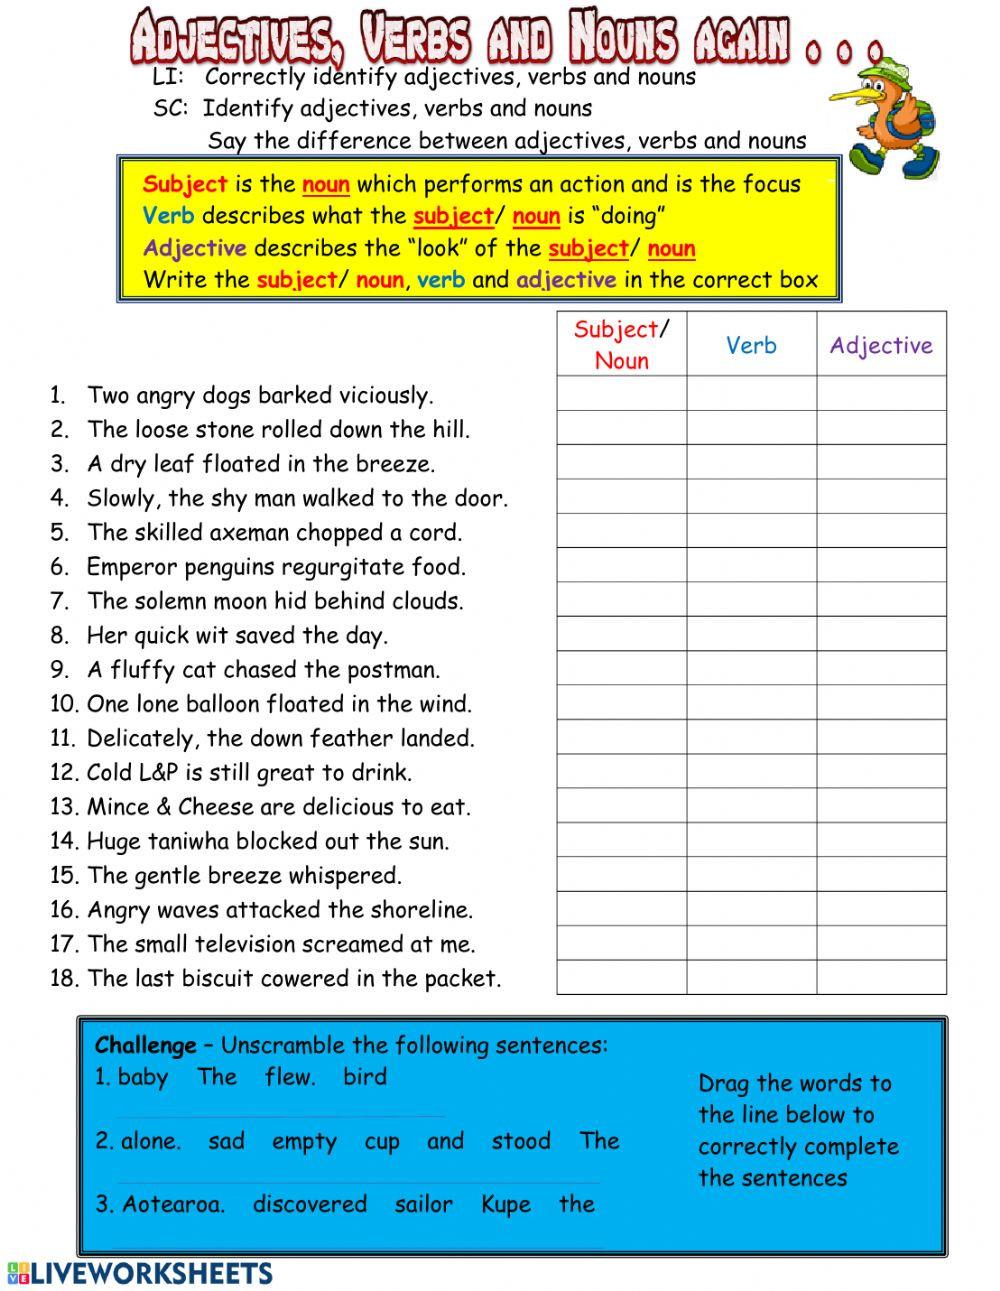 Nouns Verbs Adjectives Worksheet Adjectives Verbs and Nouns Again Interactive Worksheet